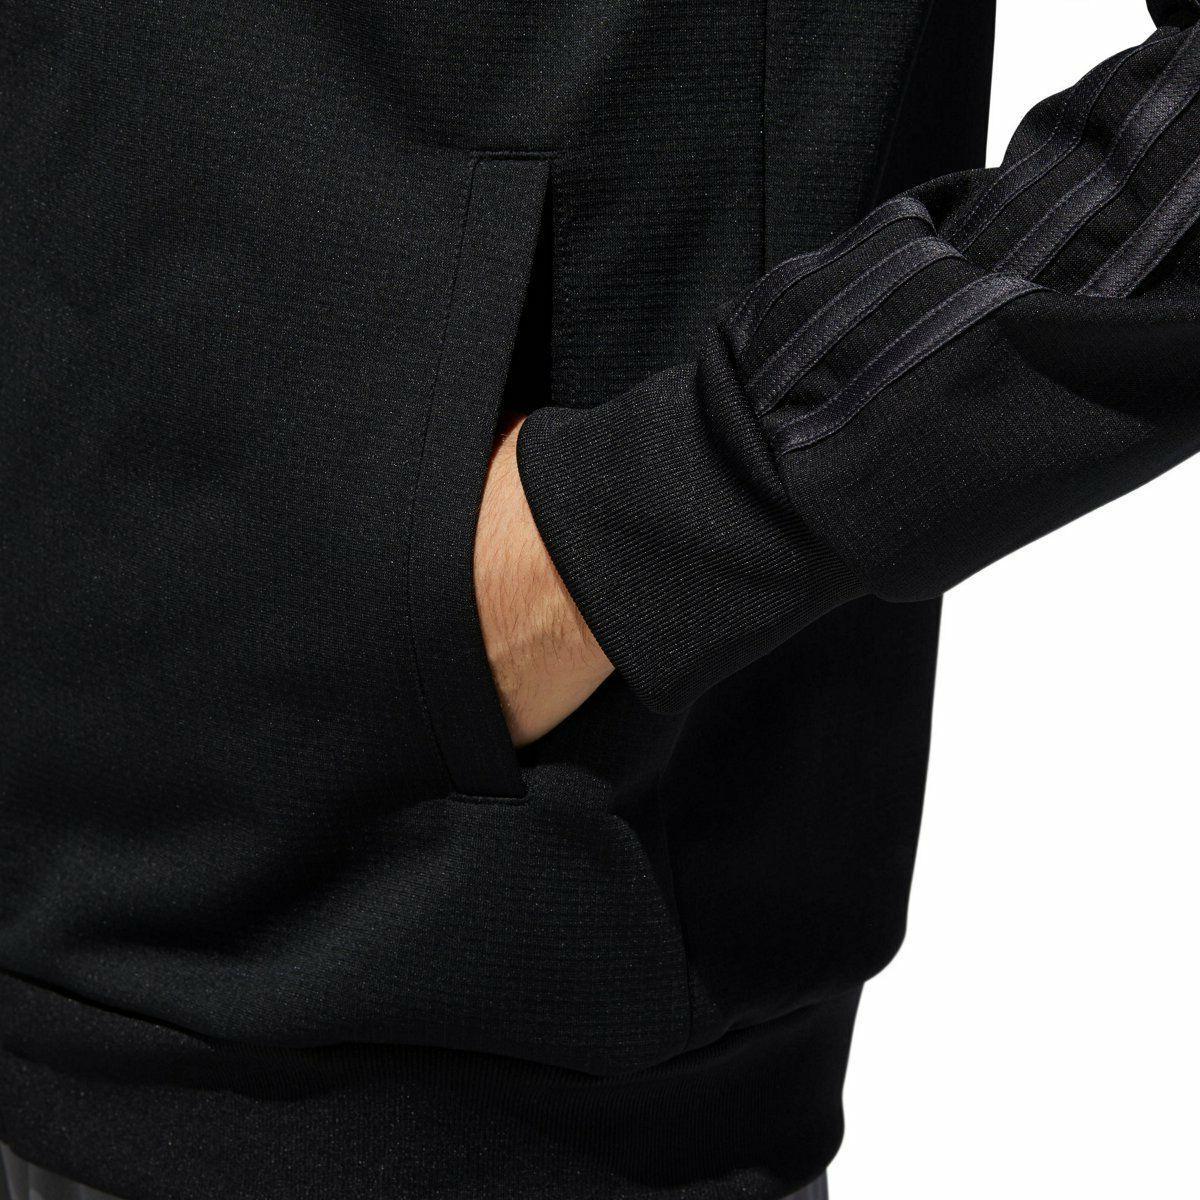 Mens Essential Track Jacket Black Zip Sleeve L-XXL